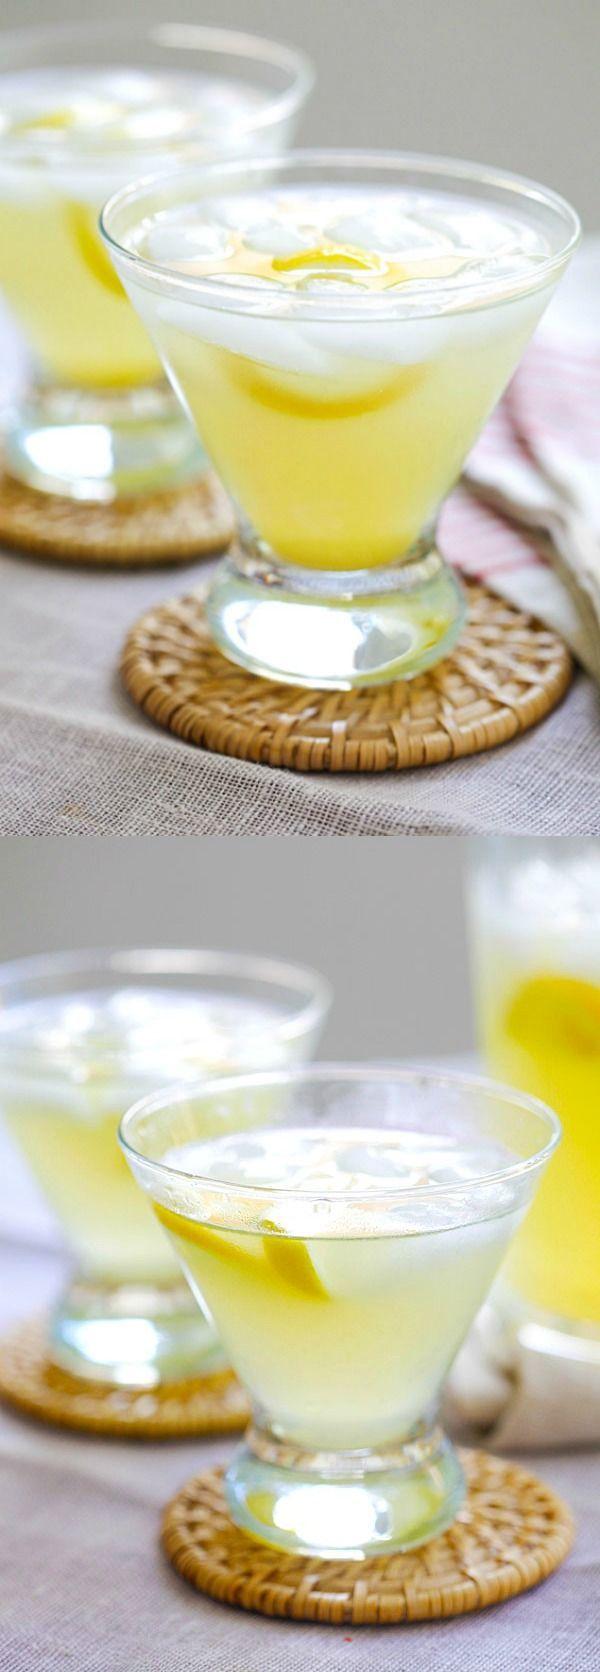 Lemon Drop Martini (The Best Recipe!) - Rasa Malaysia